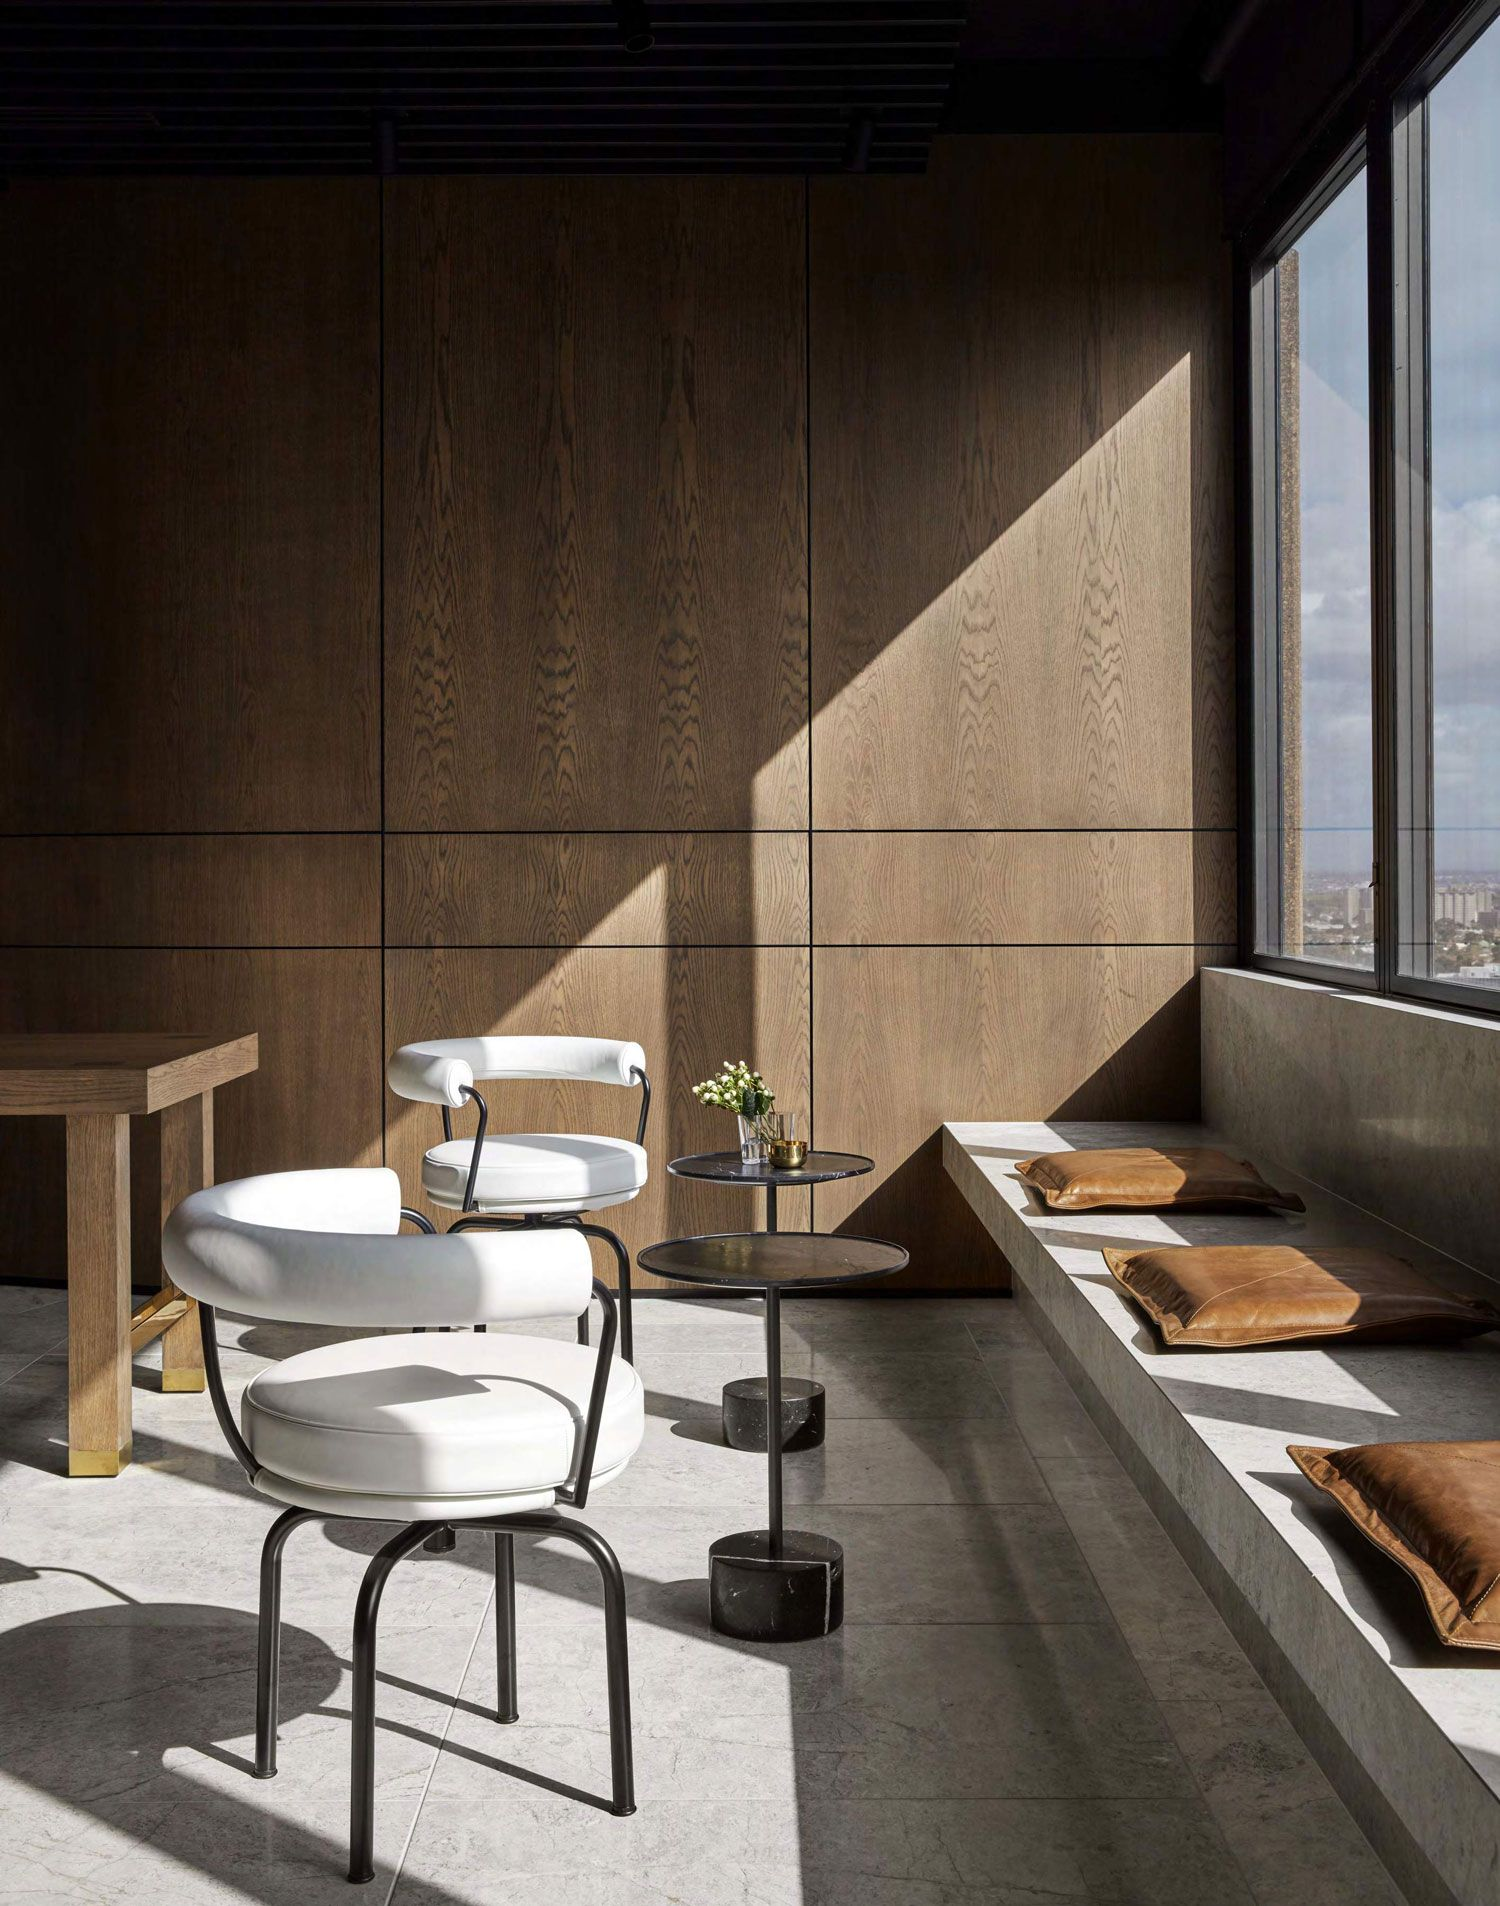 Pdg melbourne head office by studio tate interior design pinterest bureau charlotte - Bureau charlotte perriand ...